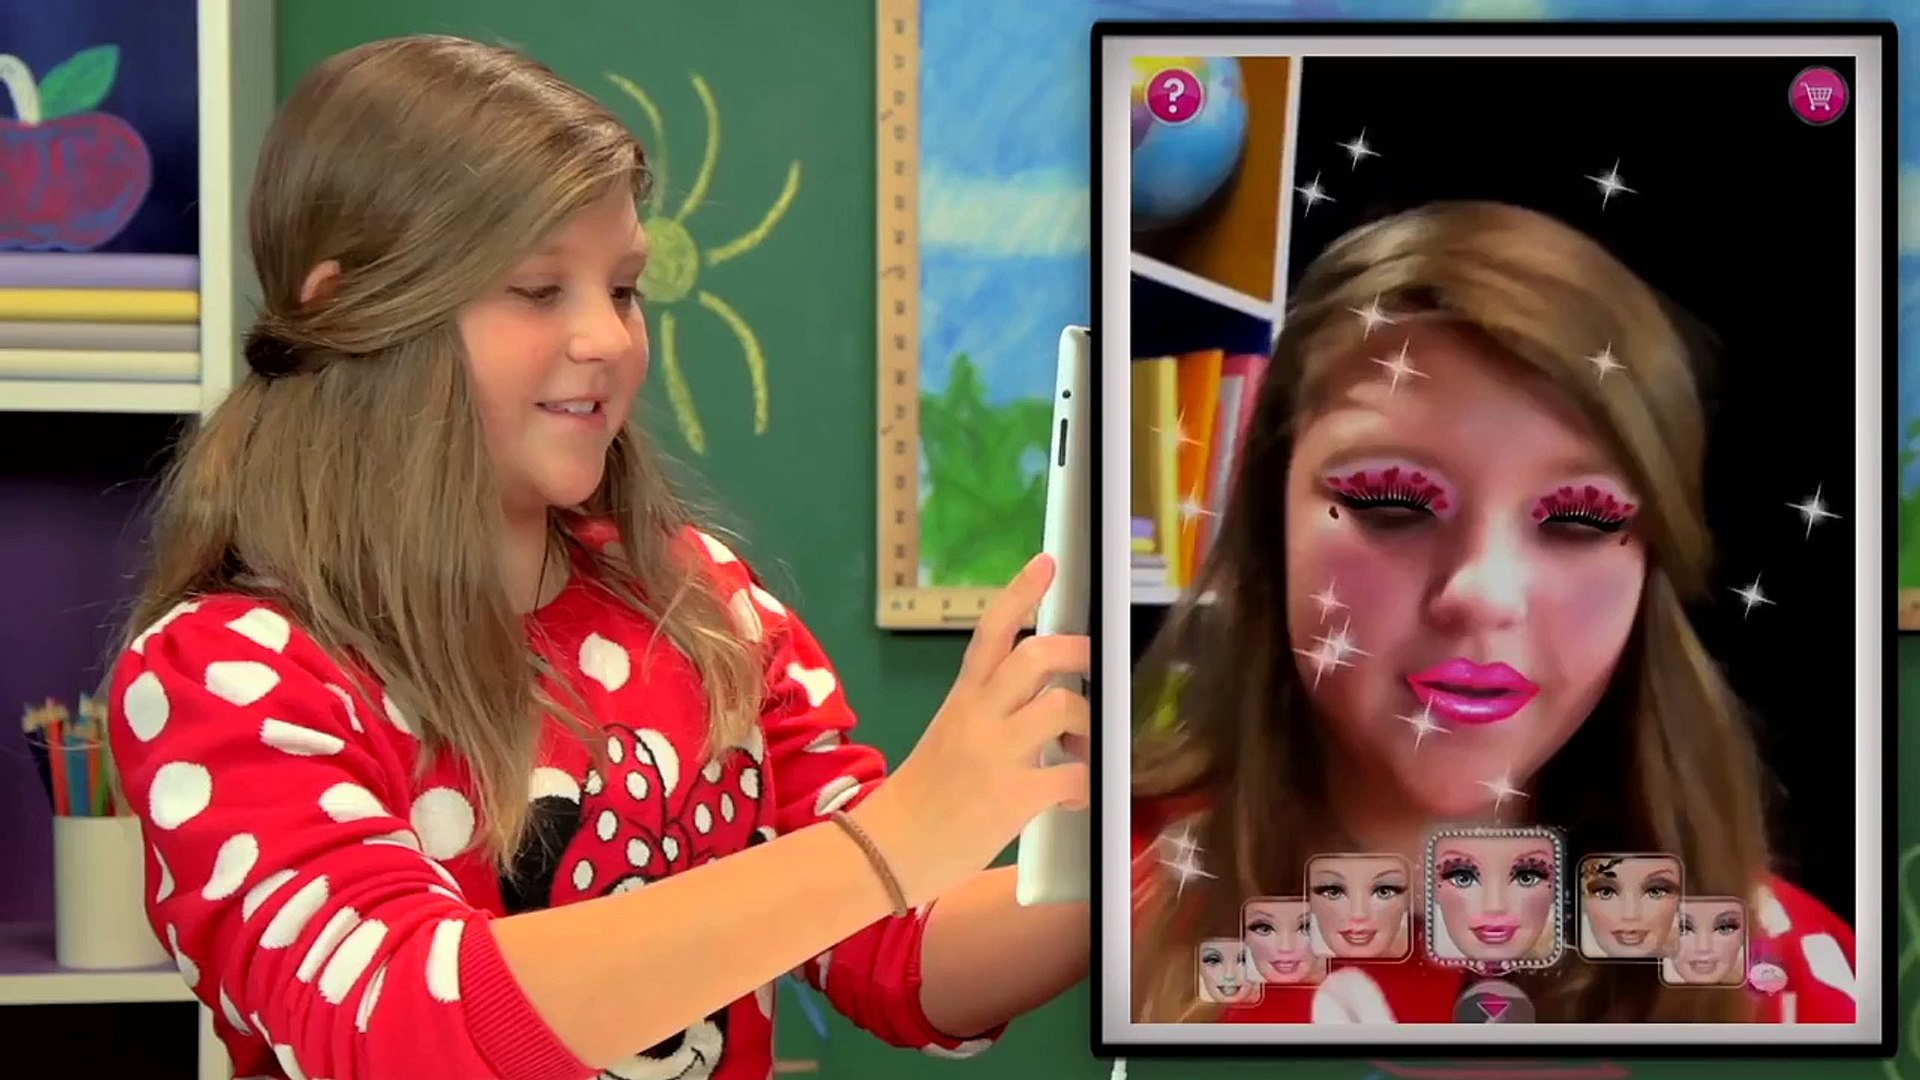 KIDS PLAY MAKEUP APPS?! (Kids React: Gaming)